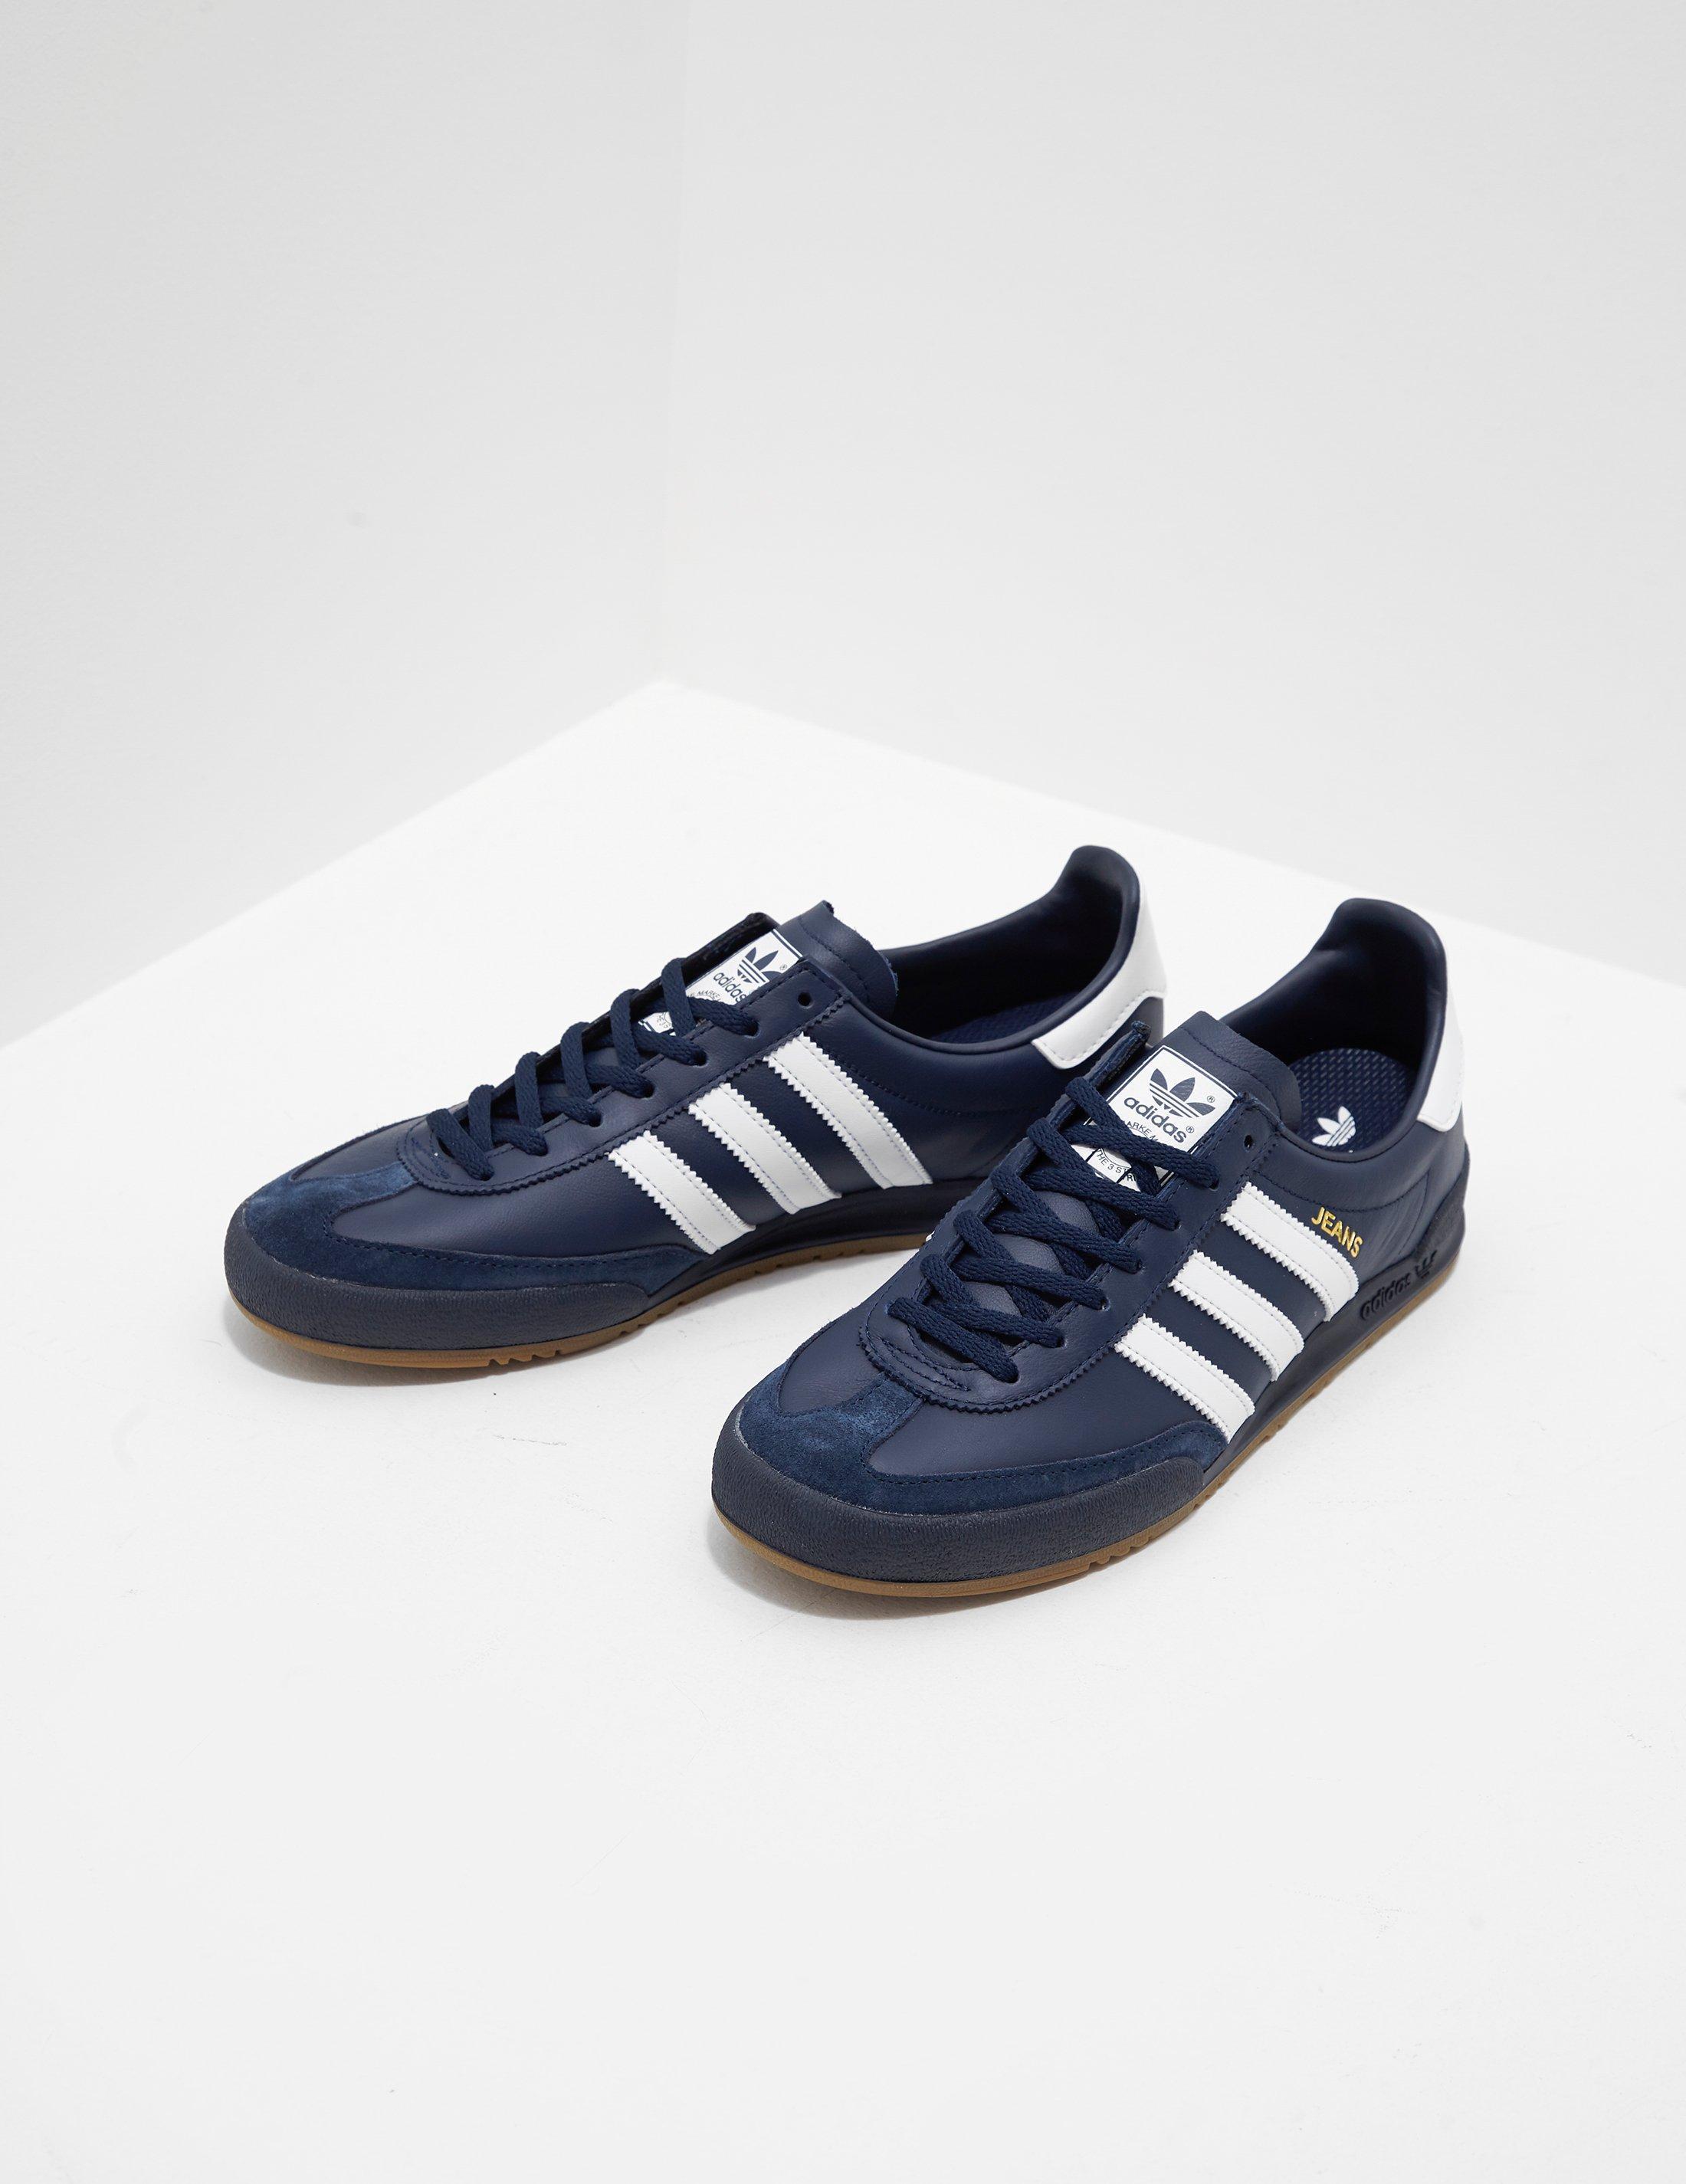 7aa9b874fa55 Lyst - adidas Originals Mens Jeans Blue in Blue for Men